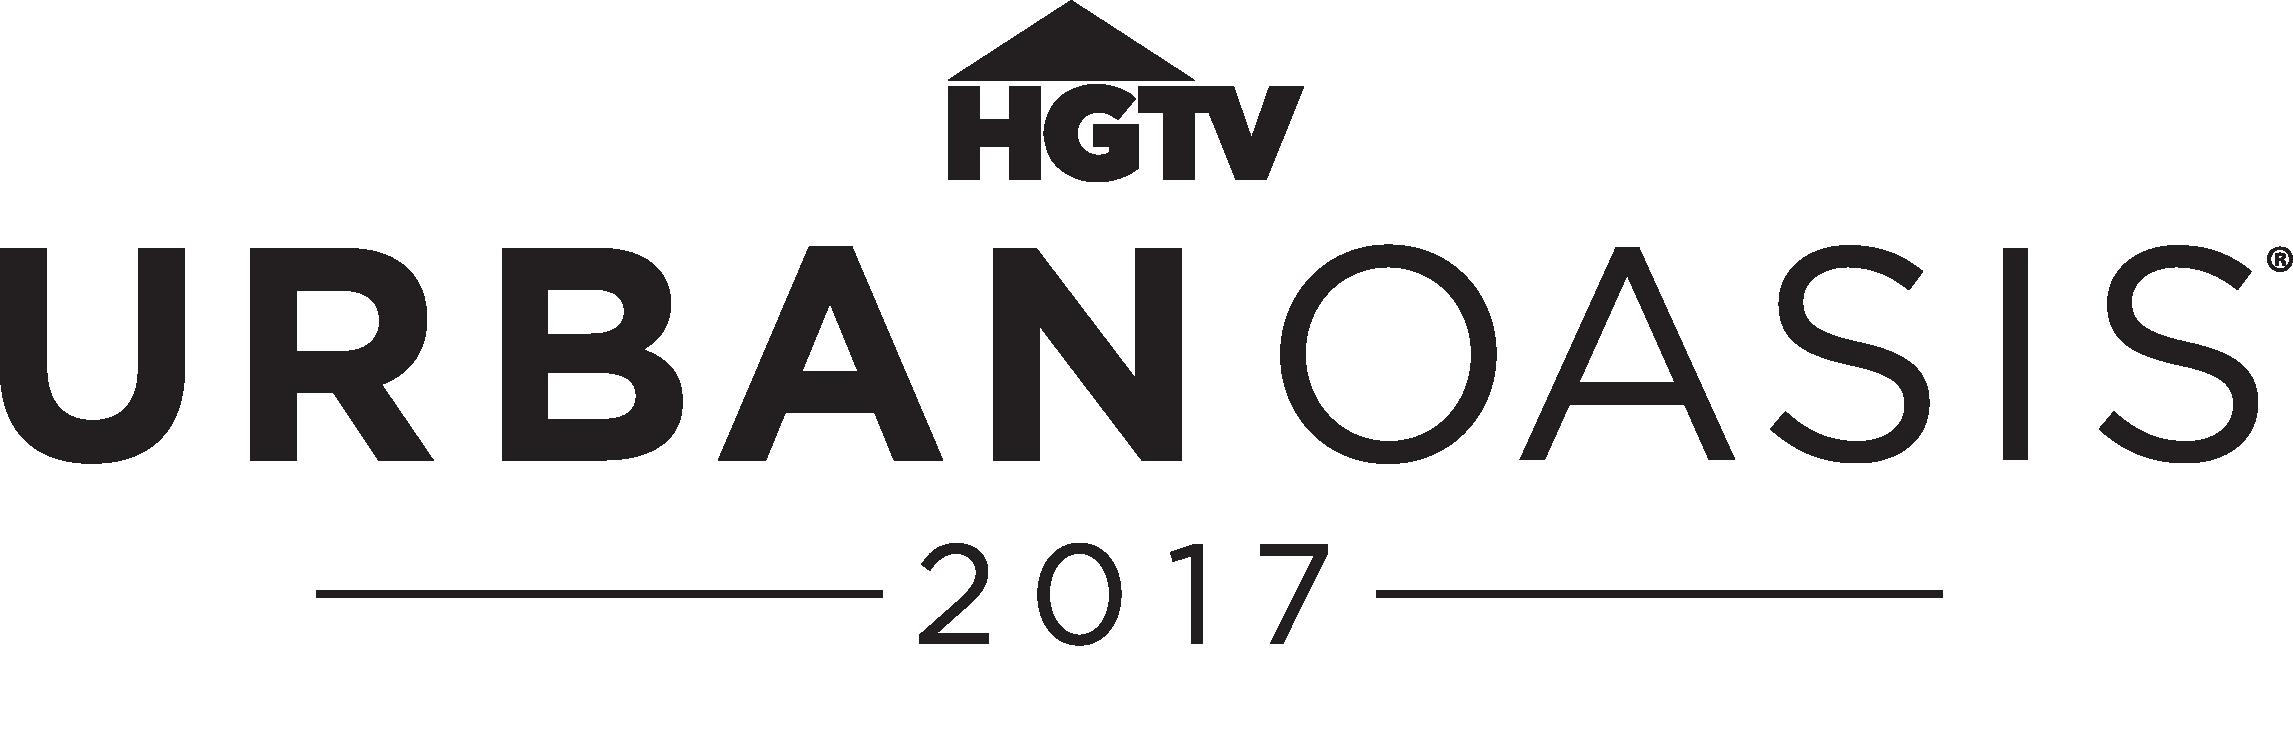 HGTV Urban Oasis 2017 Giveaway